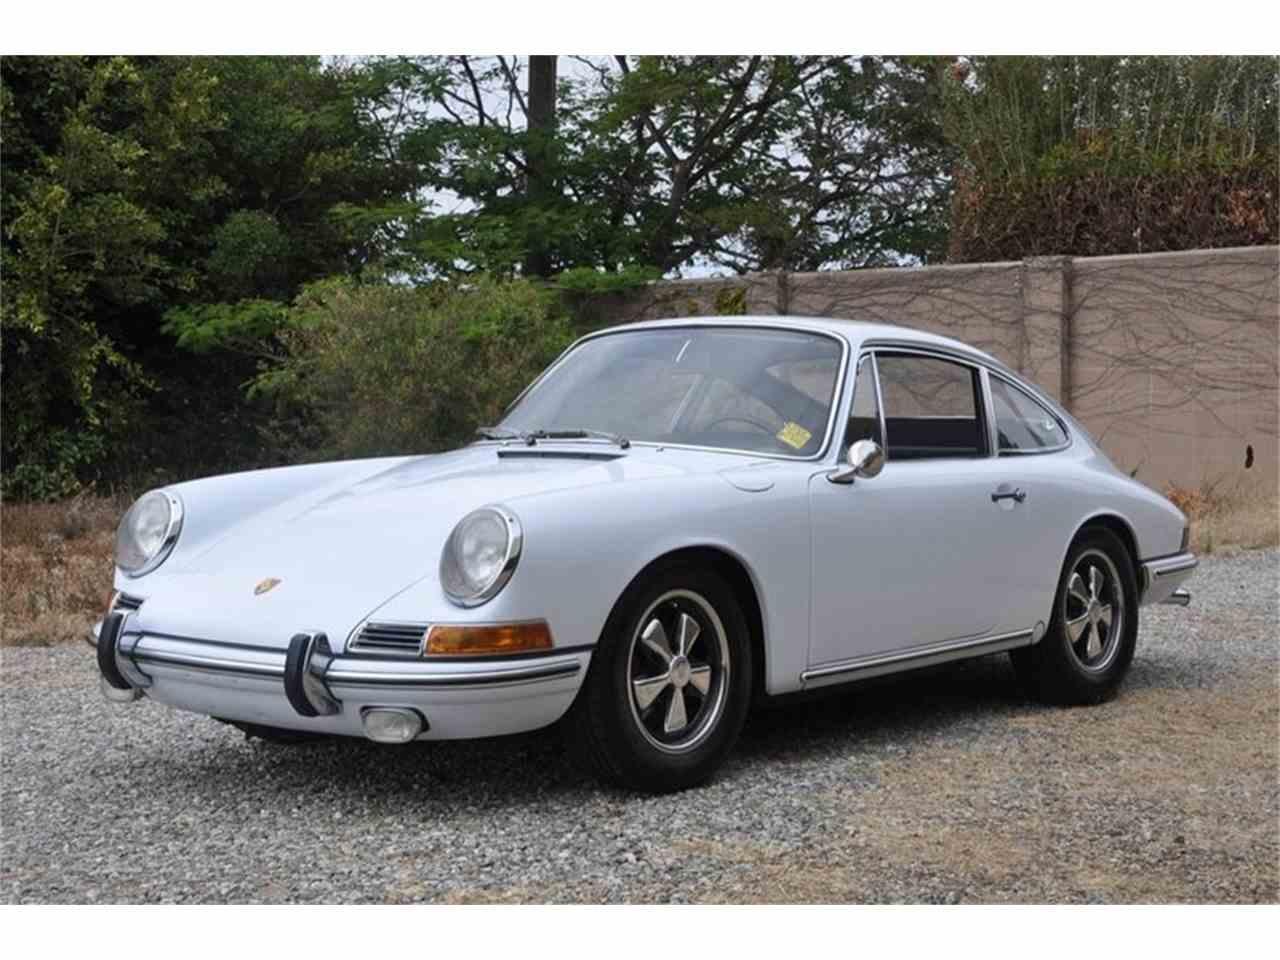 1967 Porsche 912 for Sale | ClicCars.com | CC-876359 on dzhokhar tsarnaev porsche, who invented the porsche, alex porsche,